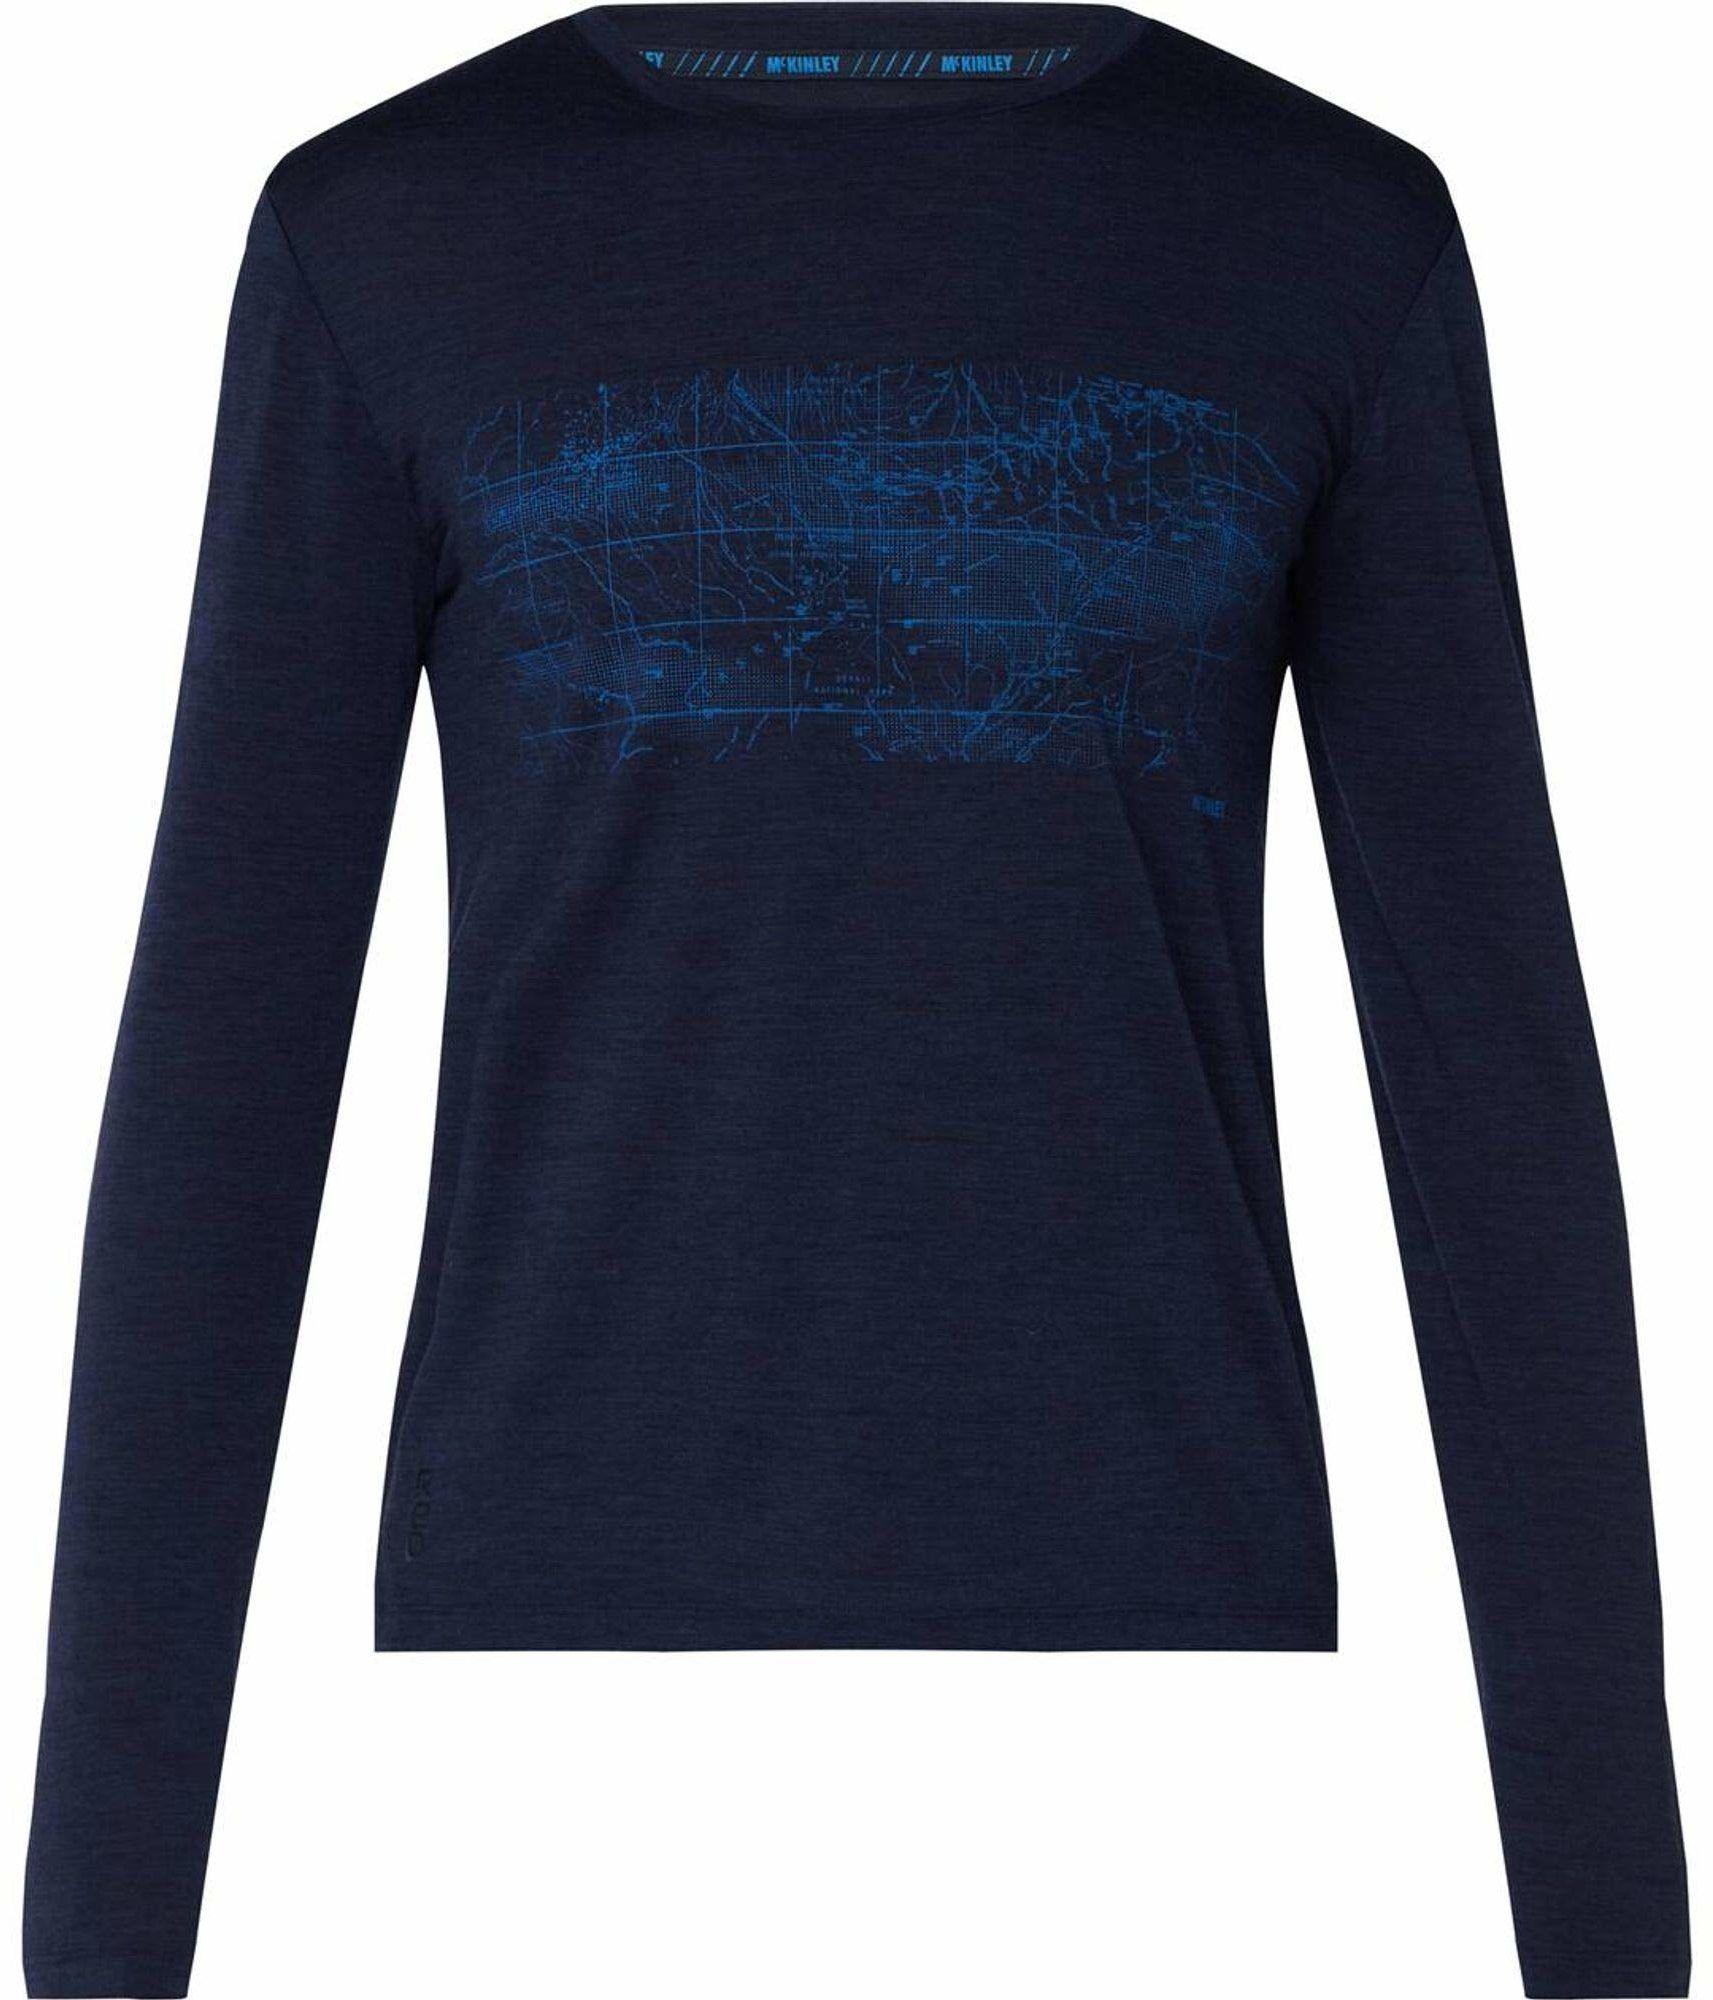 McKINLEY Męska koszulka Curra, Navy Dark, XL